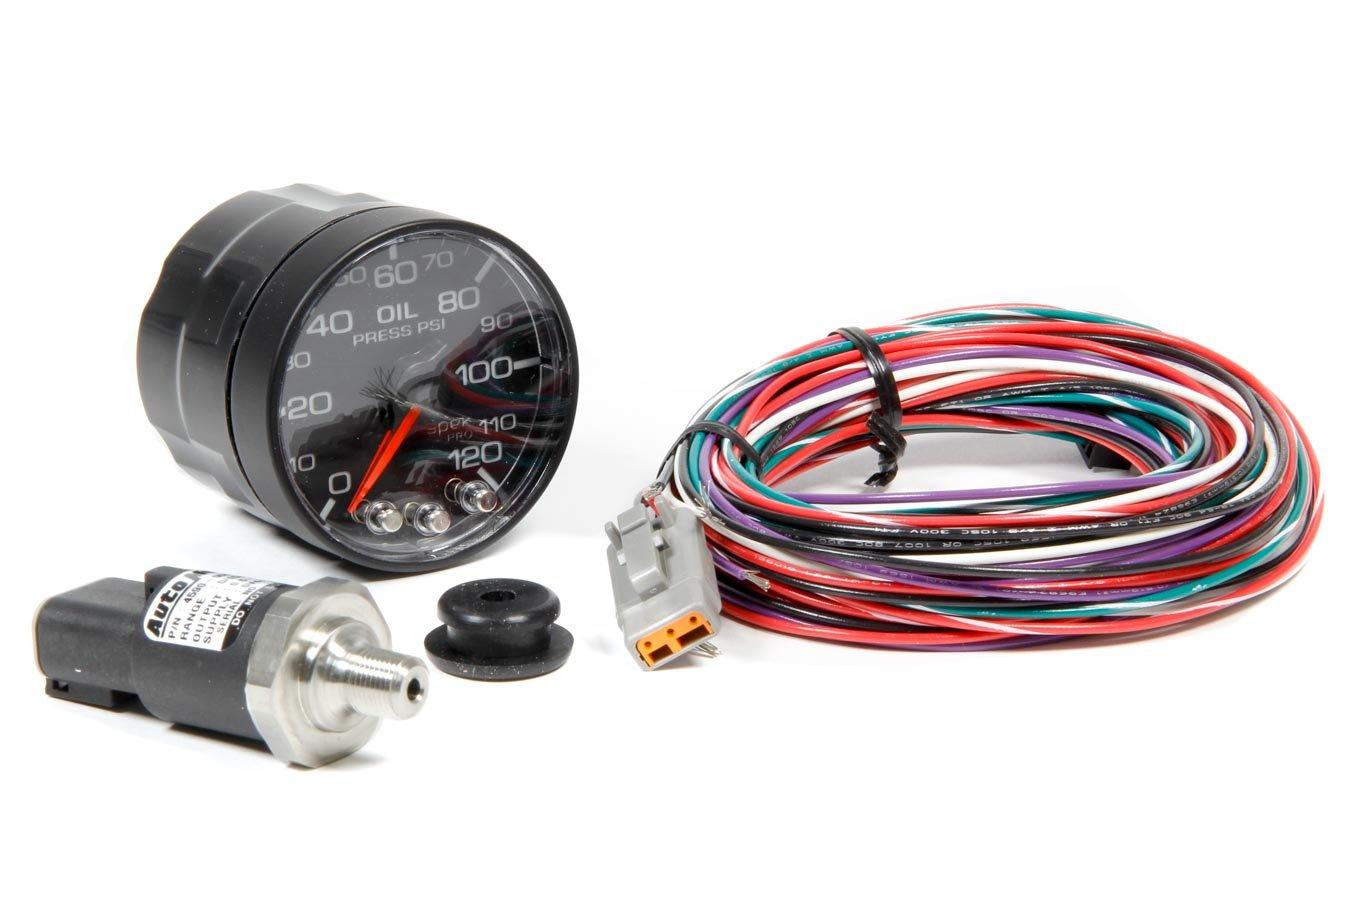 Pro Parts P325328 Spek 2 1 16 Electric Oil Pressure Psi Wiring Harness Gauge 0 120 524mm Automotive